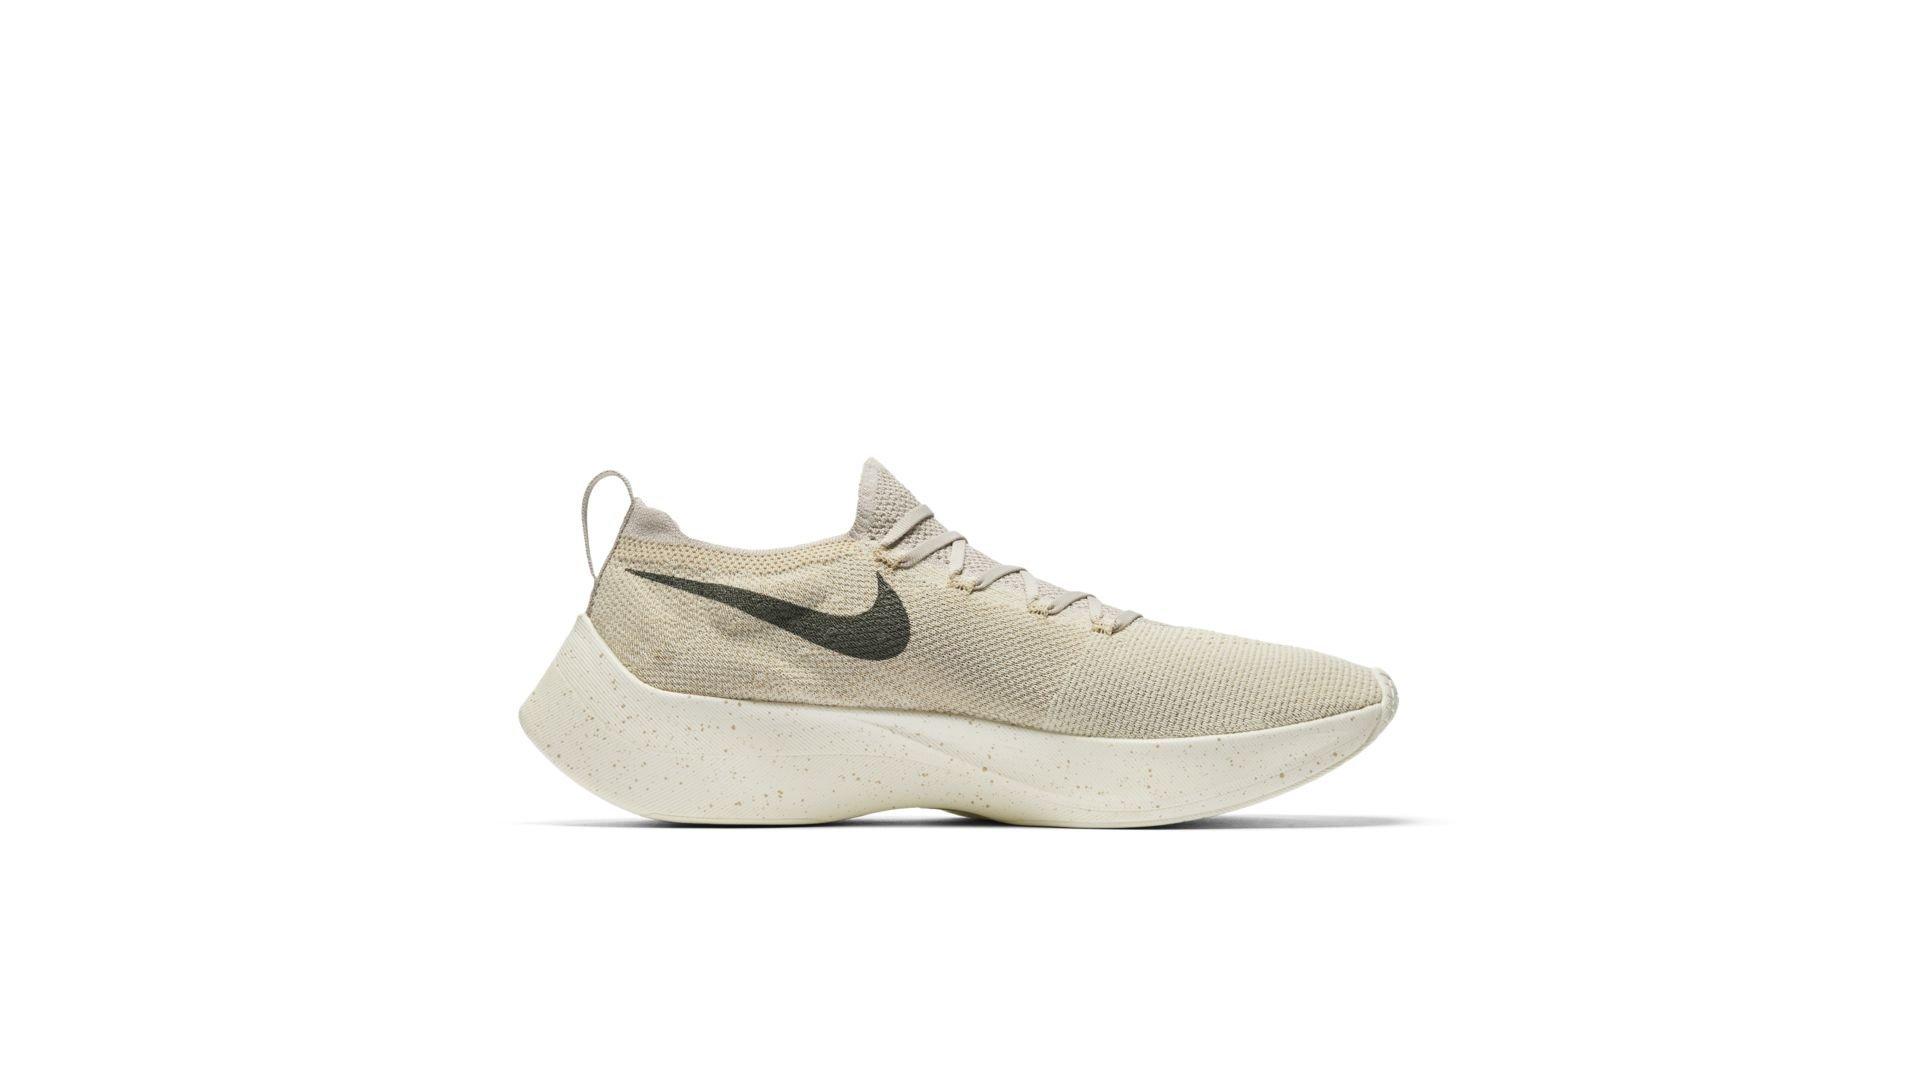 Nike Vapor Street Flyknit String (AQ1763-200)